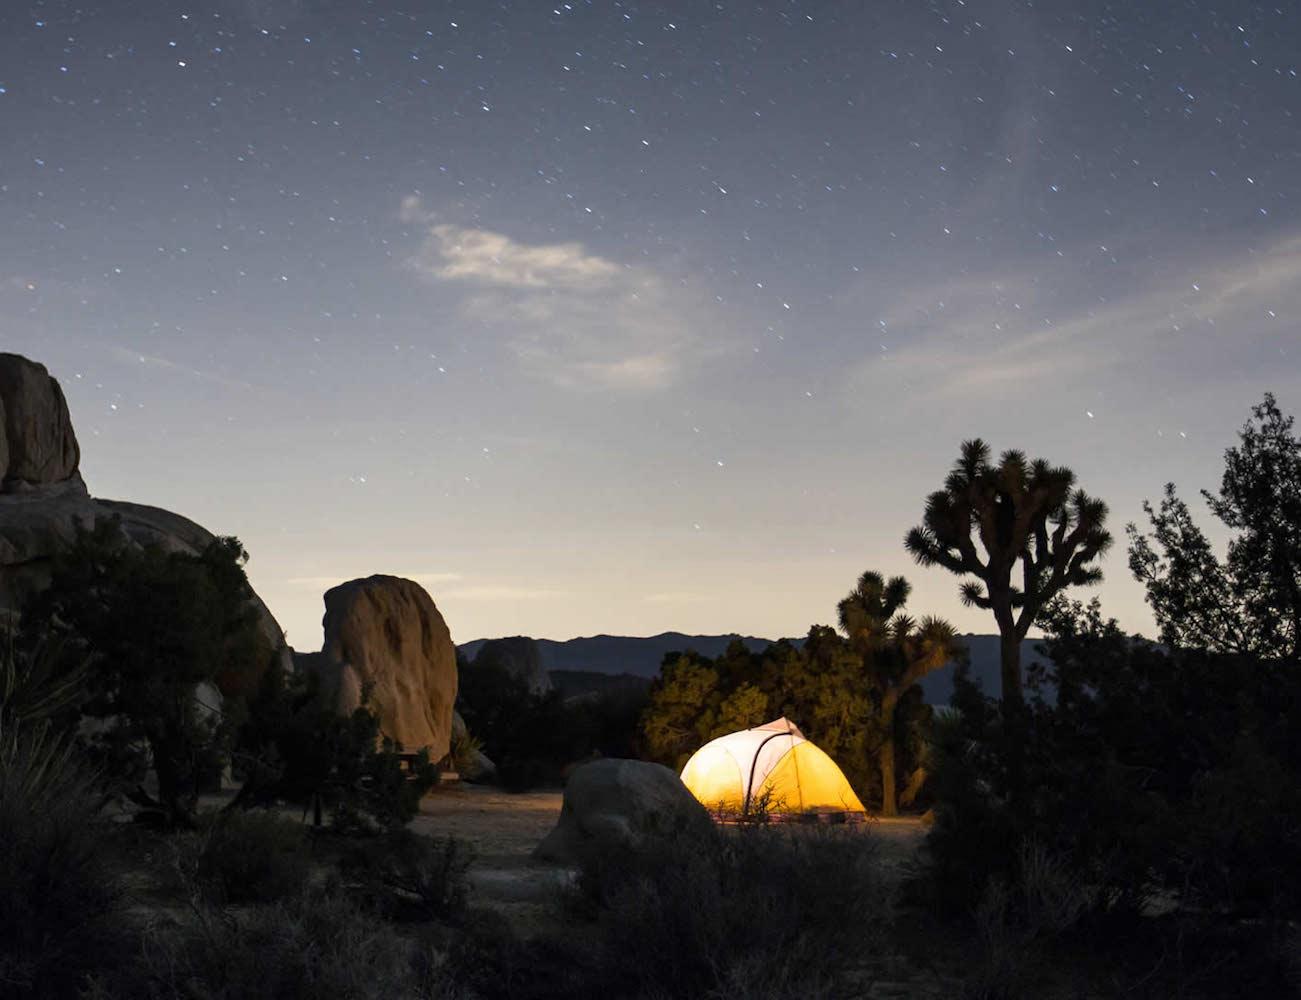 O2Tech Lantern – The World's Smartest Outdoor Lantern